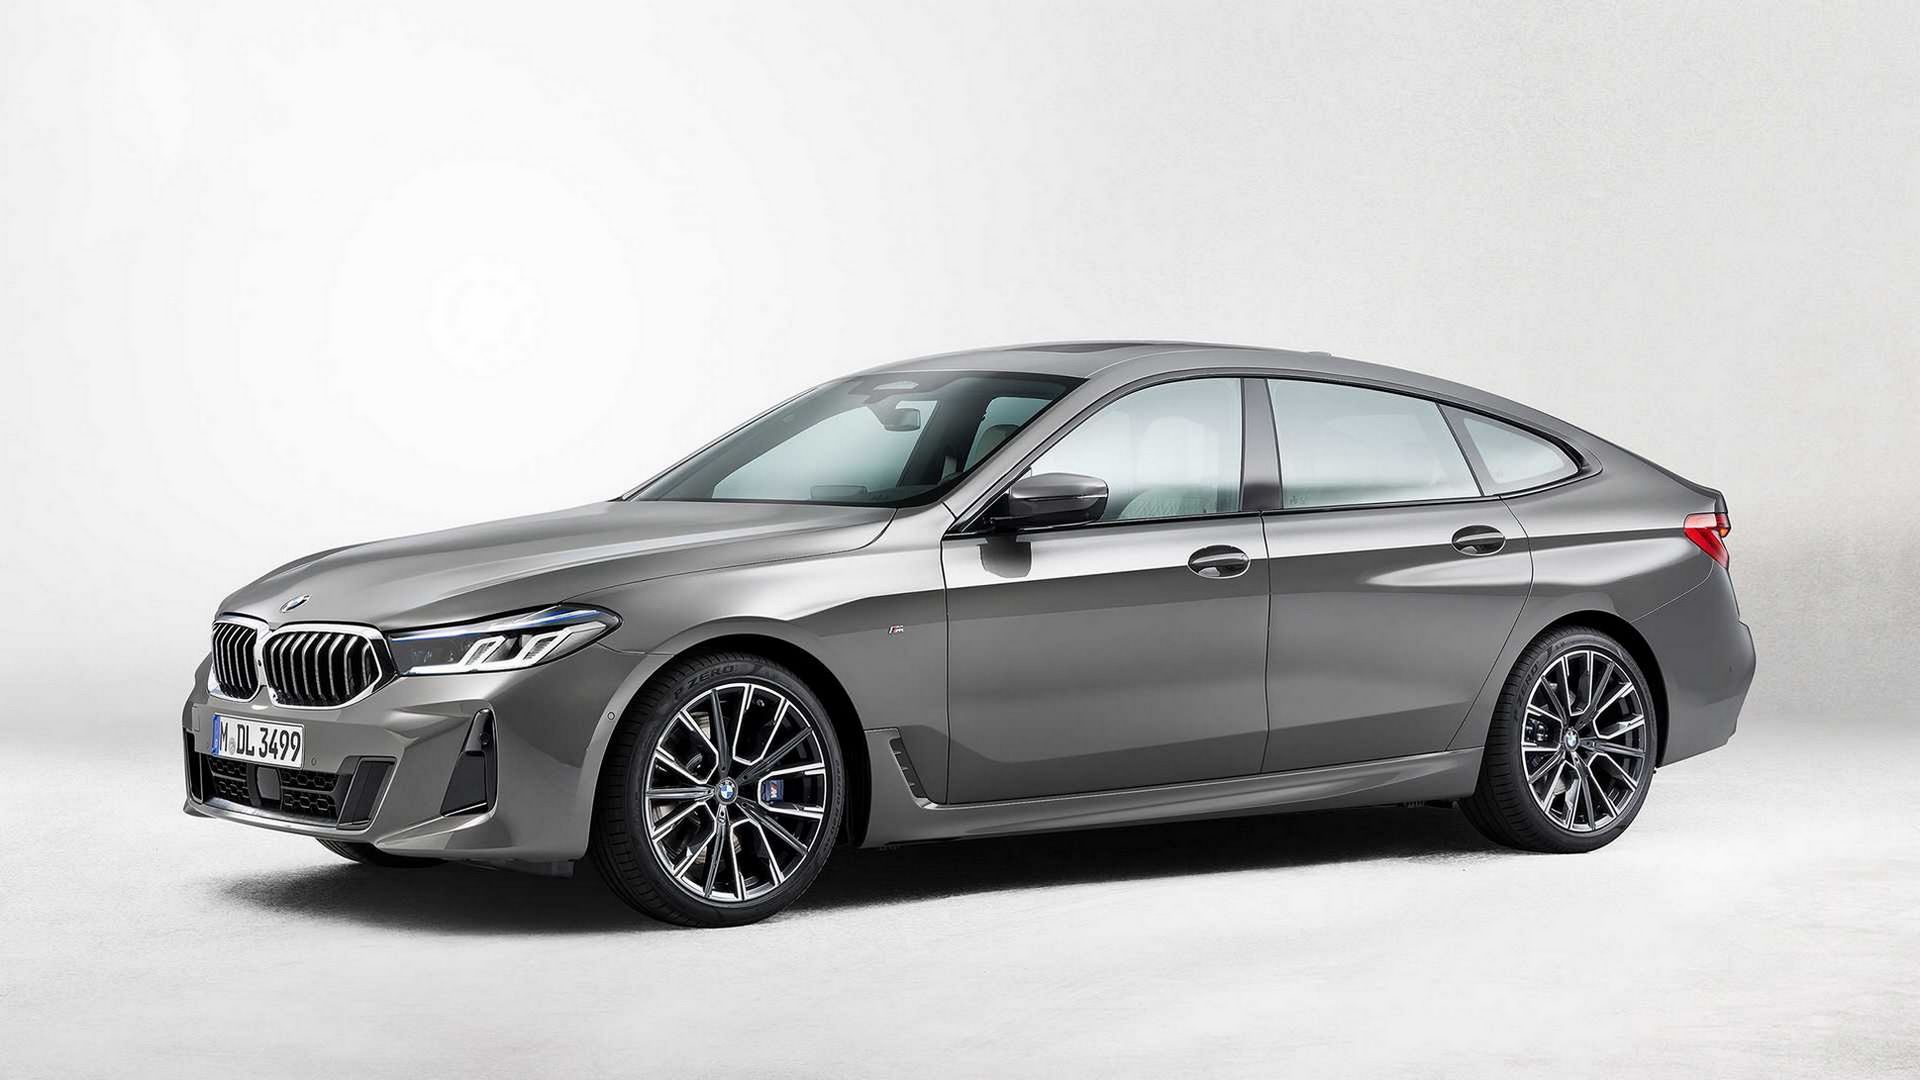 BMW-6-Series-GT-Gran-Turismo-facelift-2021-8